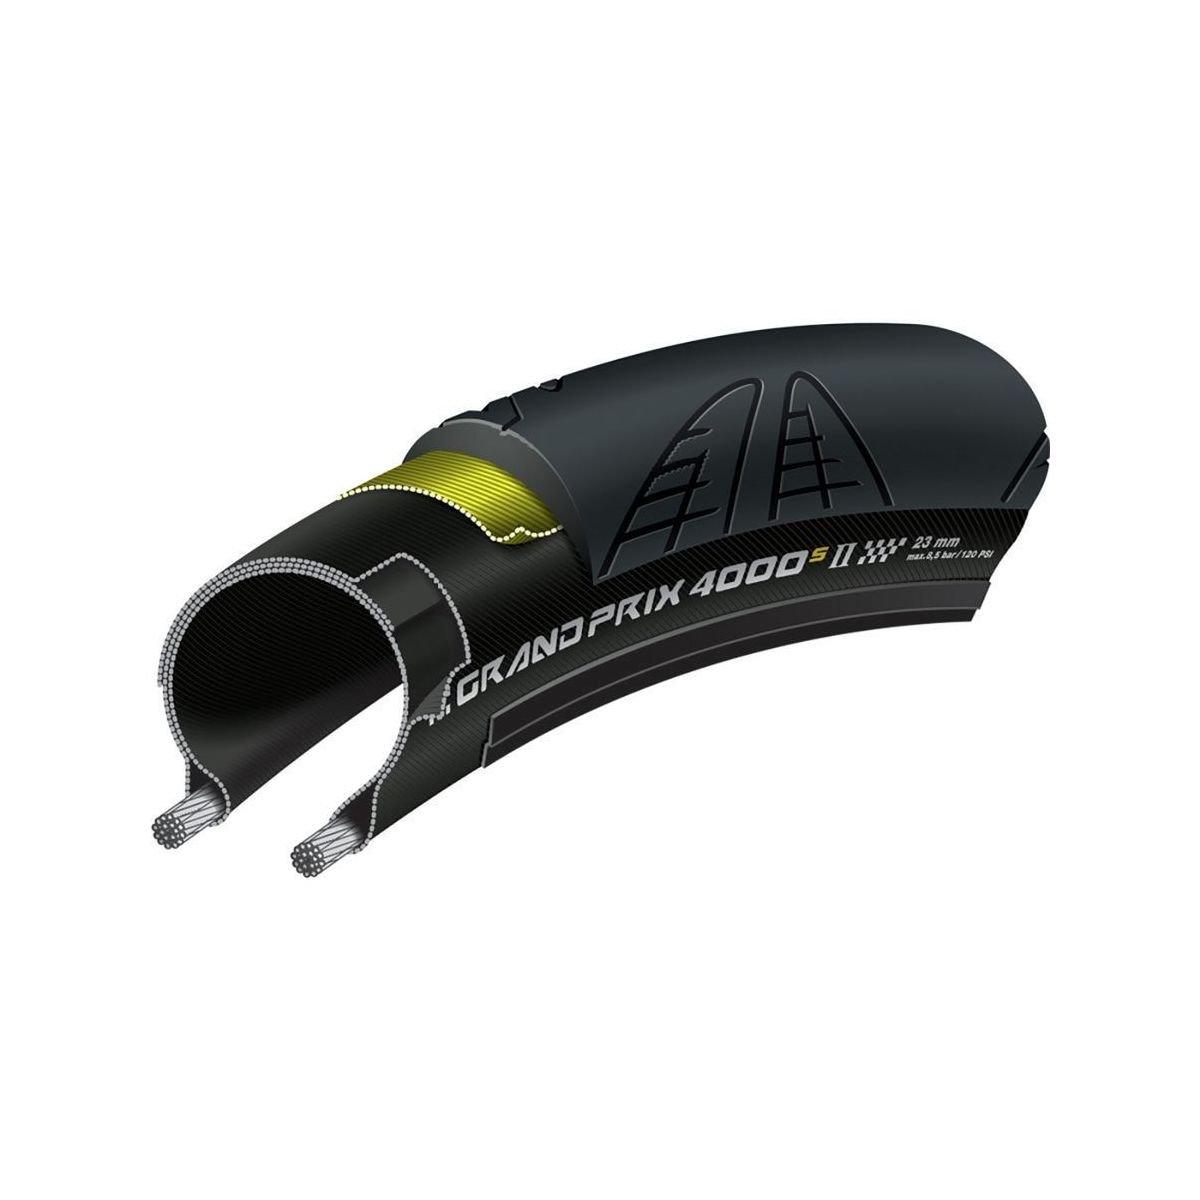 Continental Grand Prix 4000s II Cycling Tire, Black, 700 x 25C